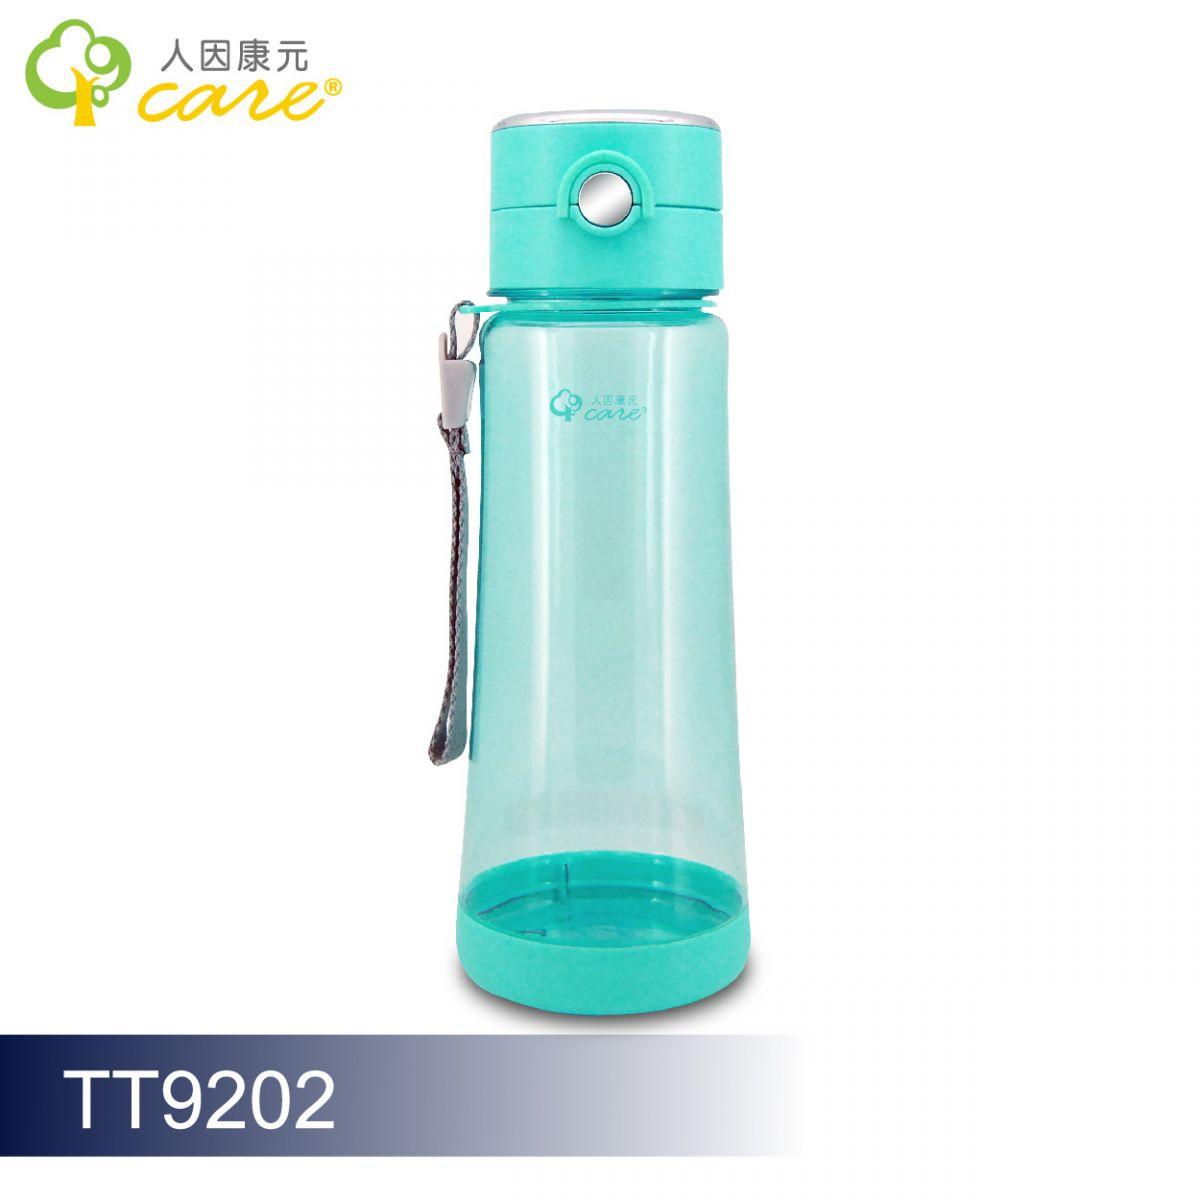 【ErgoCare】新負離子能量水壺 TT9202G 湖水綠 920ml